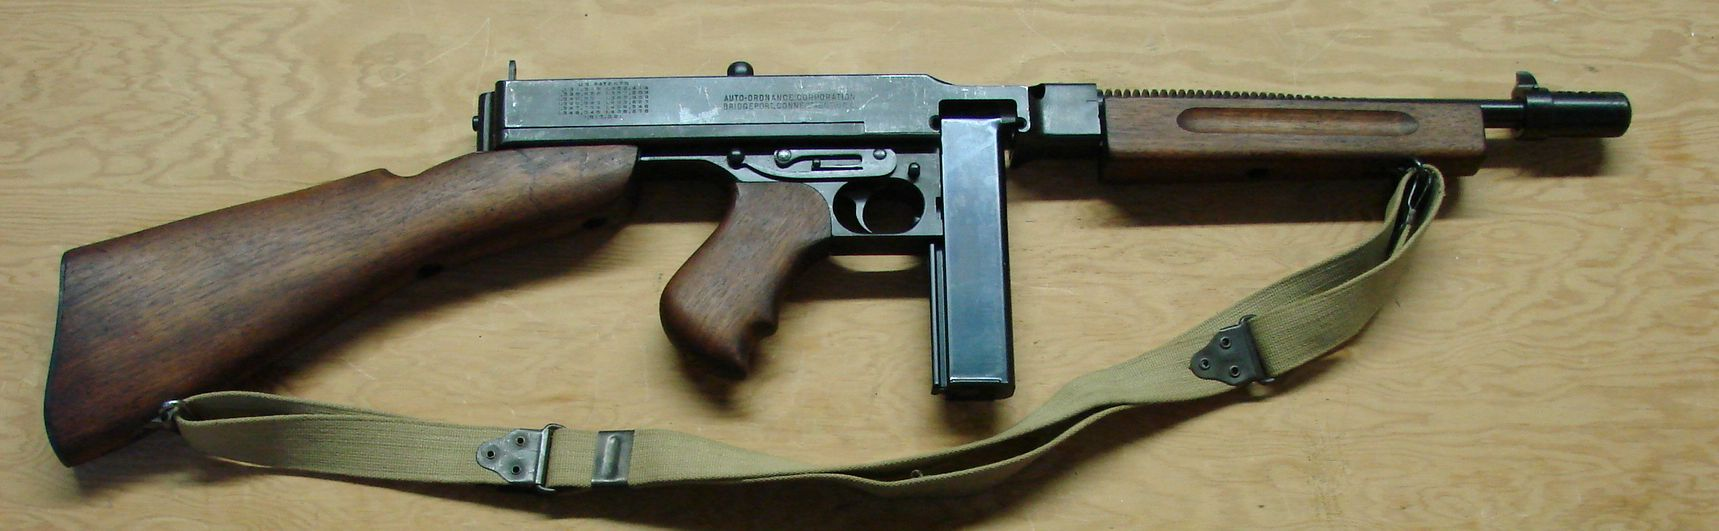 68563d1260232096-my-new-ww2-thompson-m1-thompson-m1928a1-m1a1-carbine.-copy.jpg